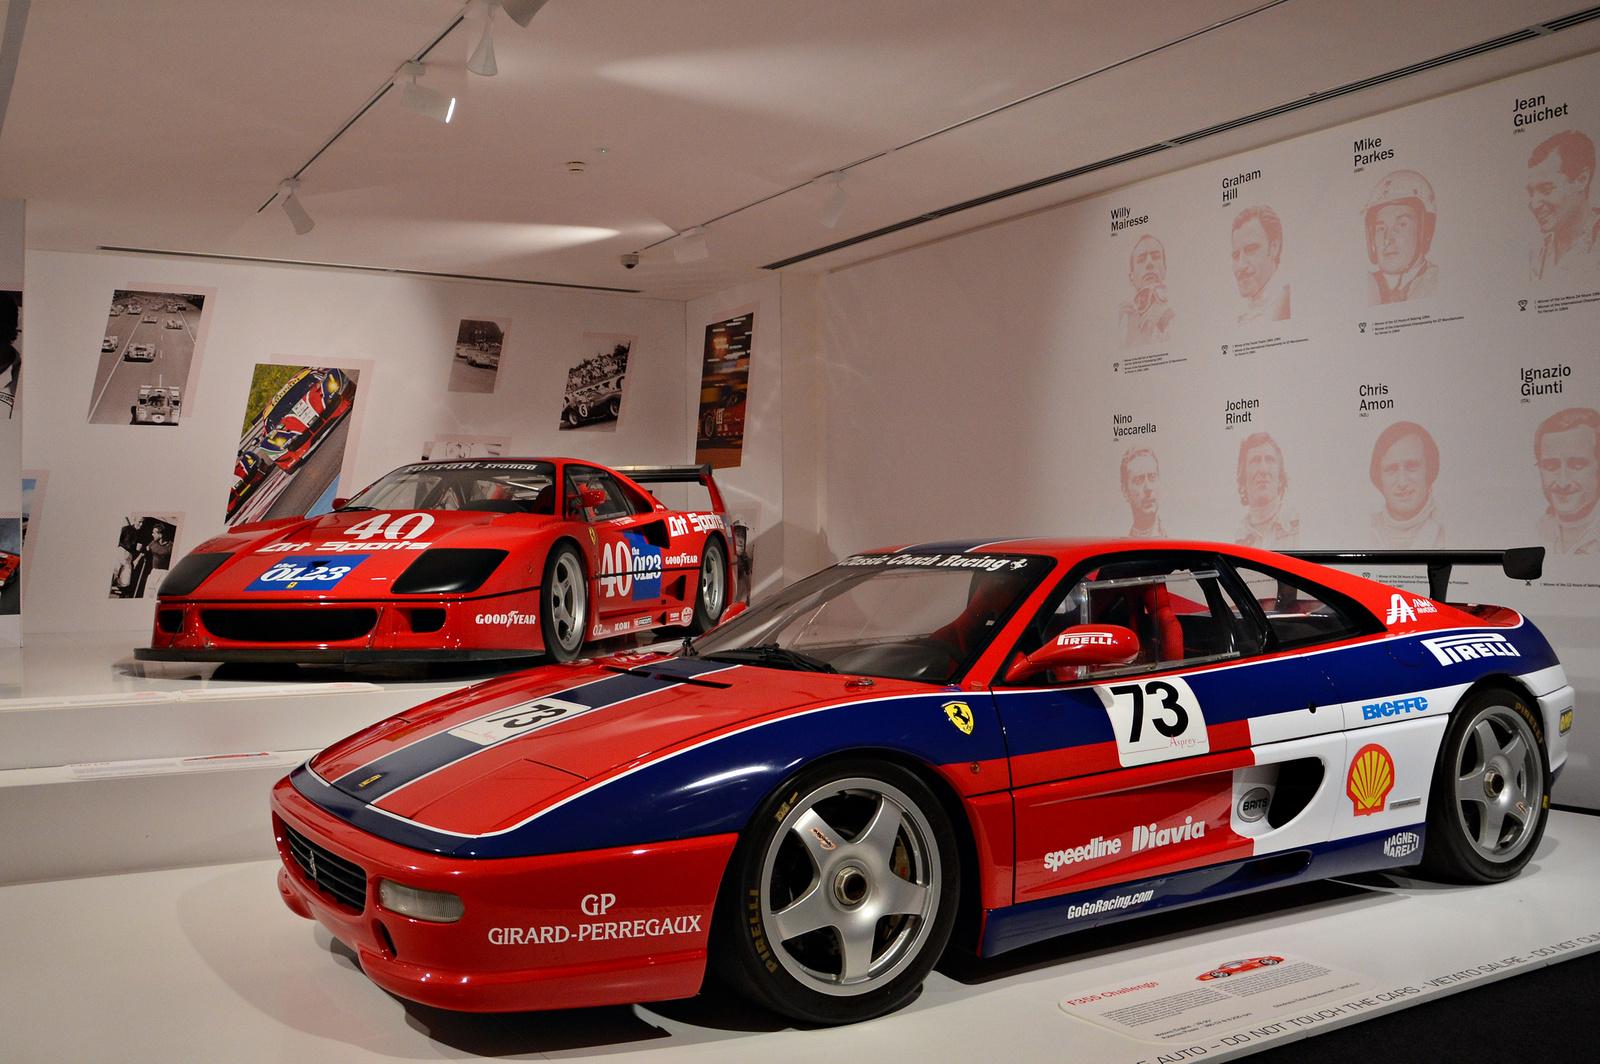 Ferrari F355 Challenge -- F40 LM